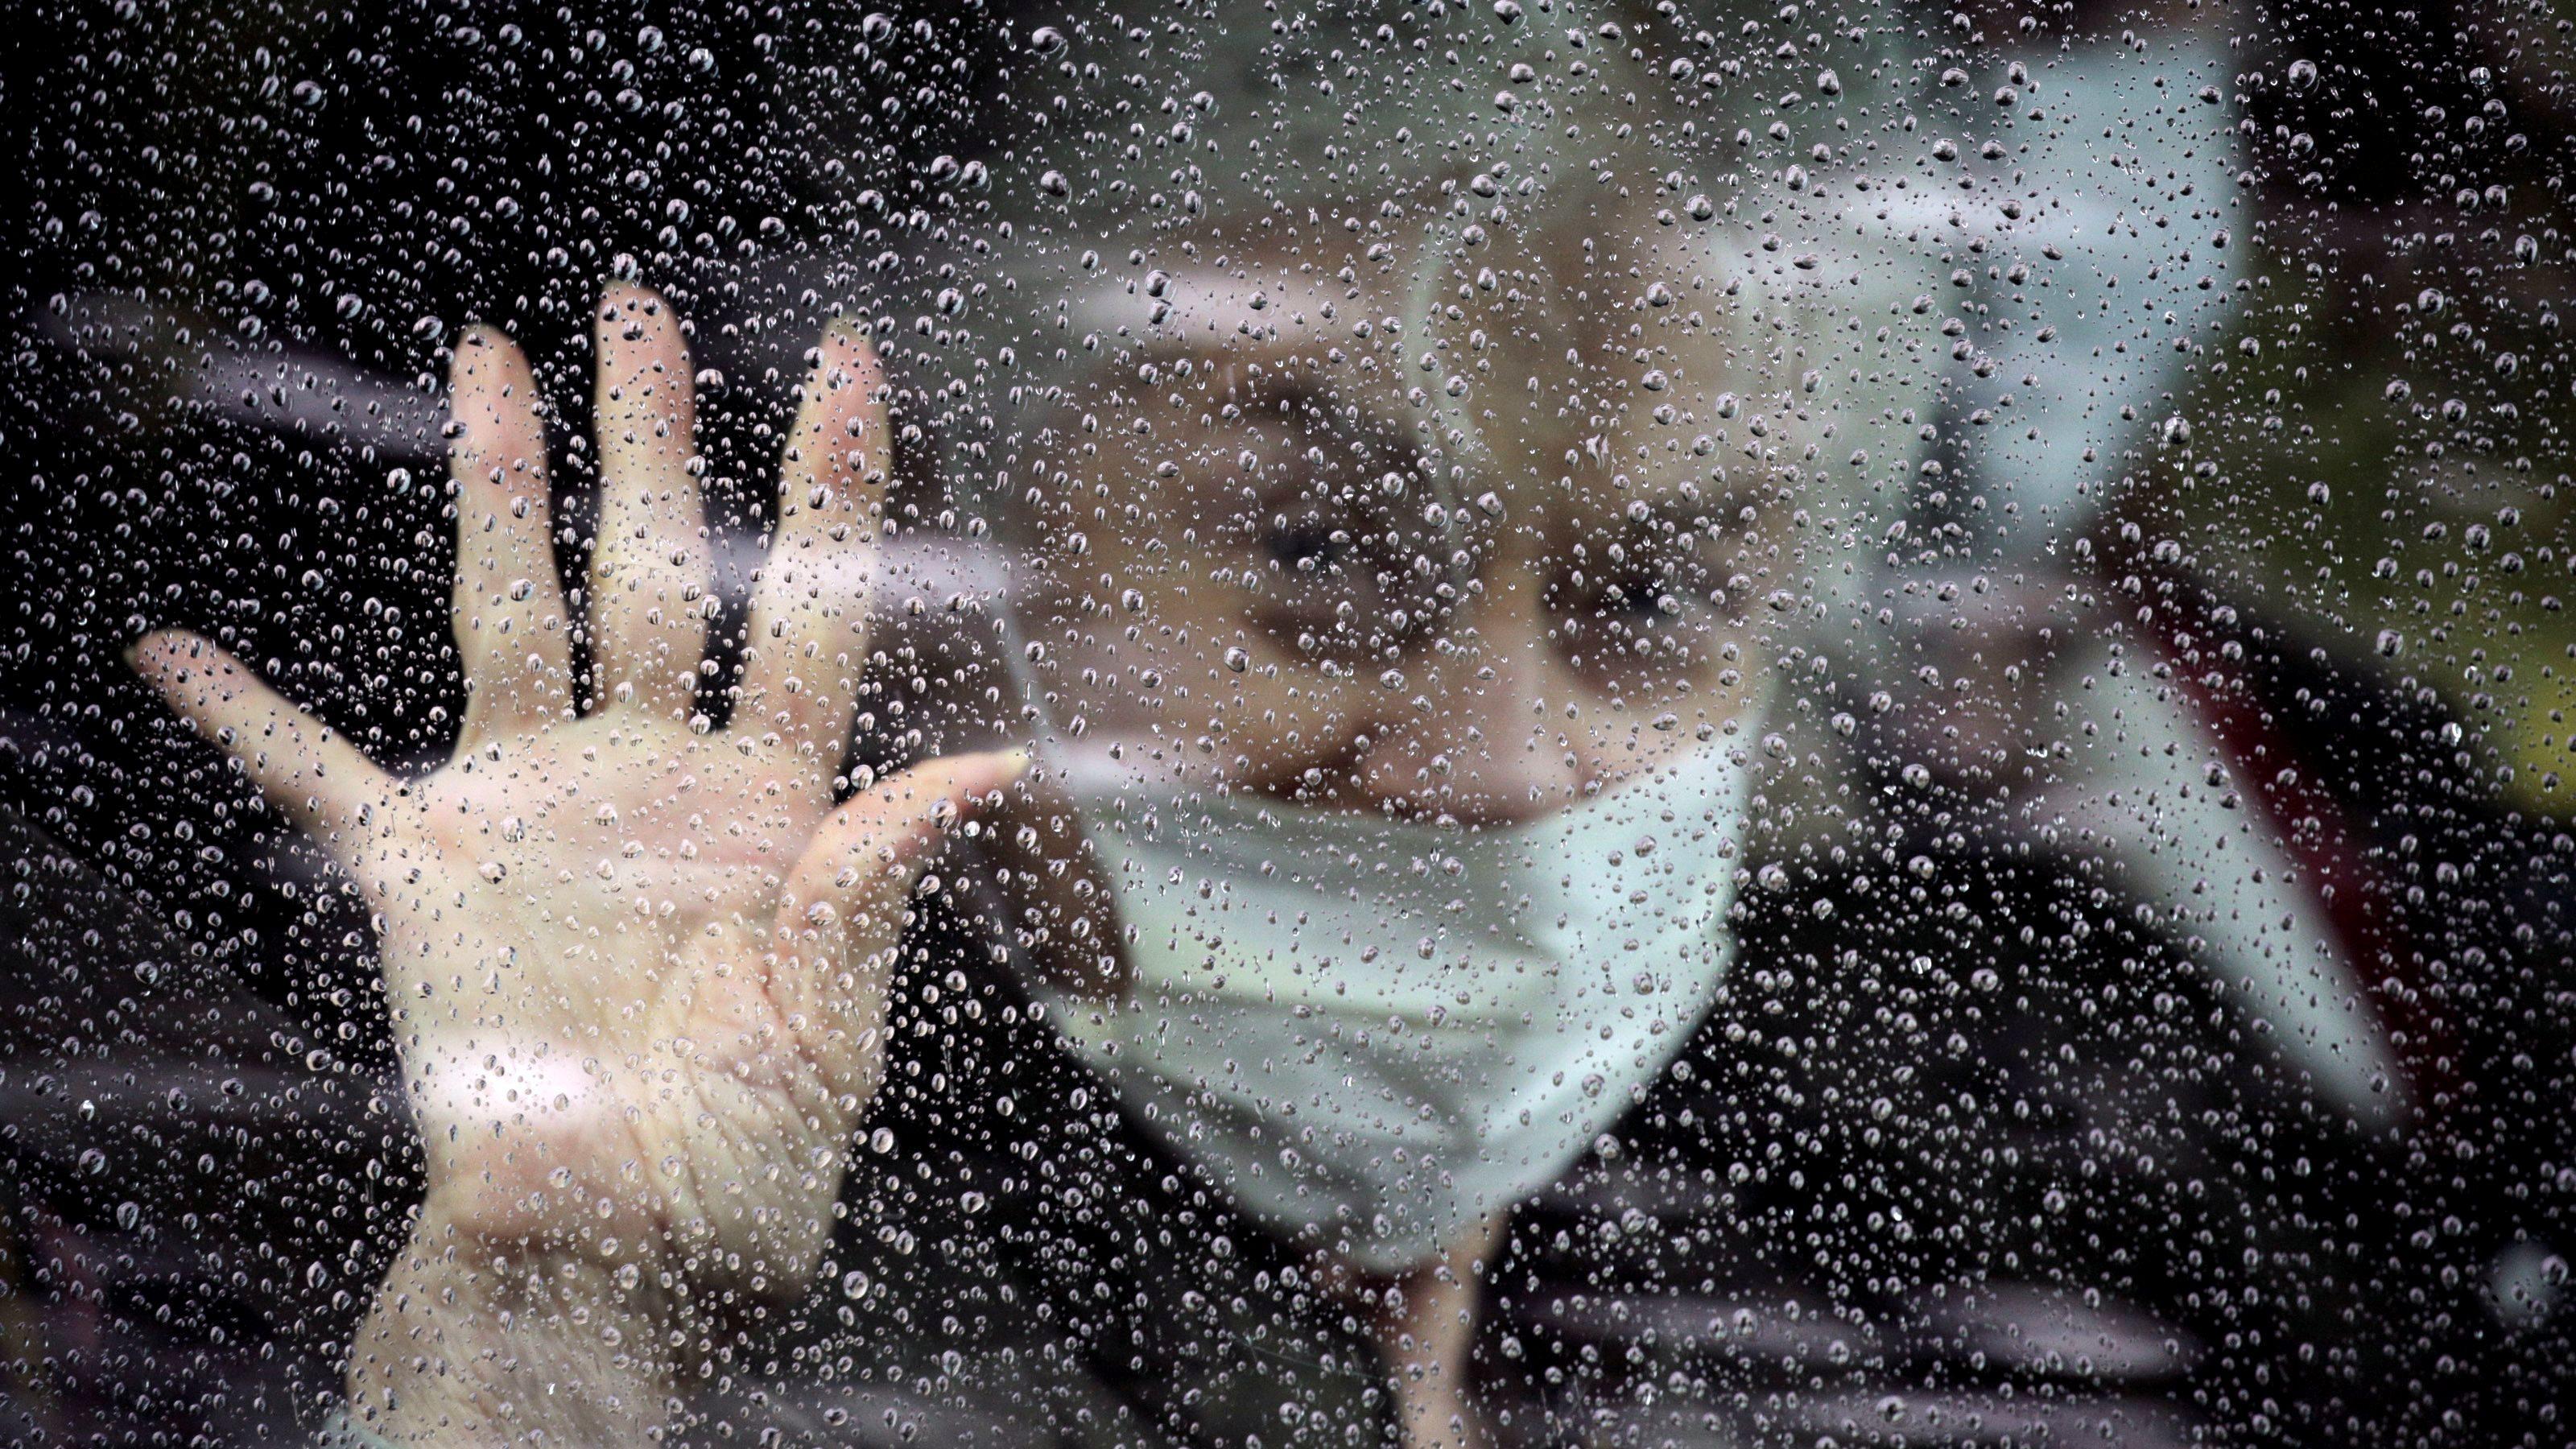 Outbreak of the coronavirus disease